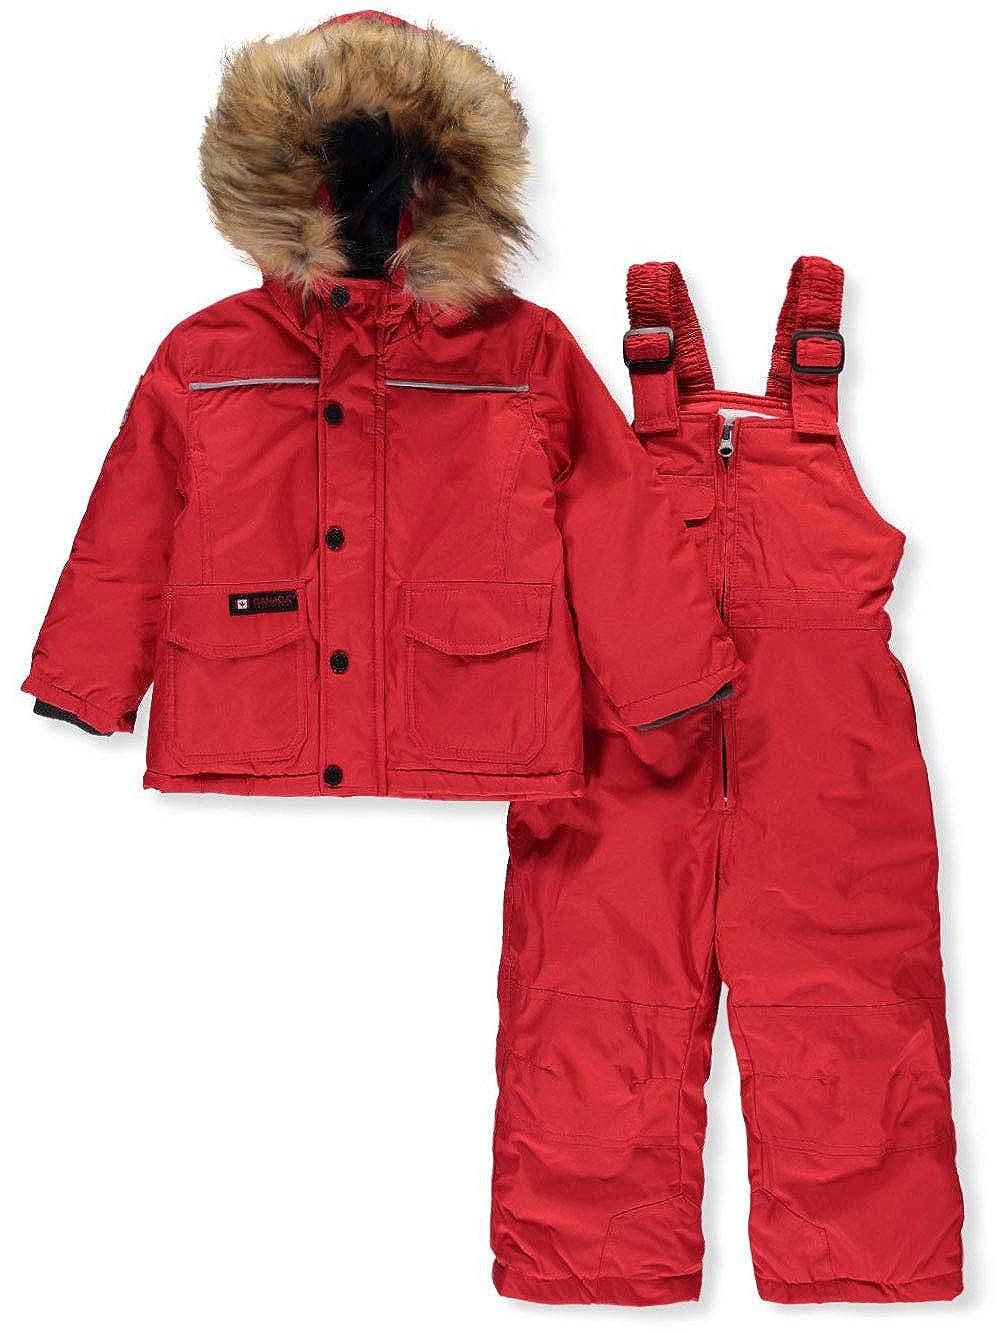 CANADA WEATHER GEAR Baby Girls' 2-Piece Snowsuit